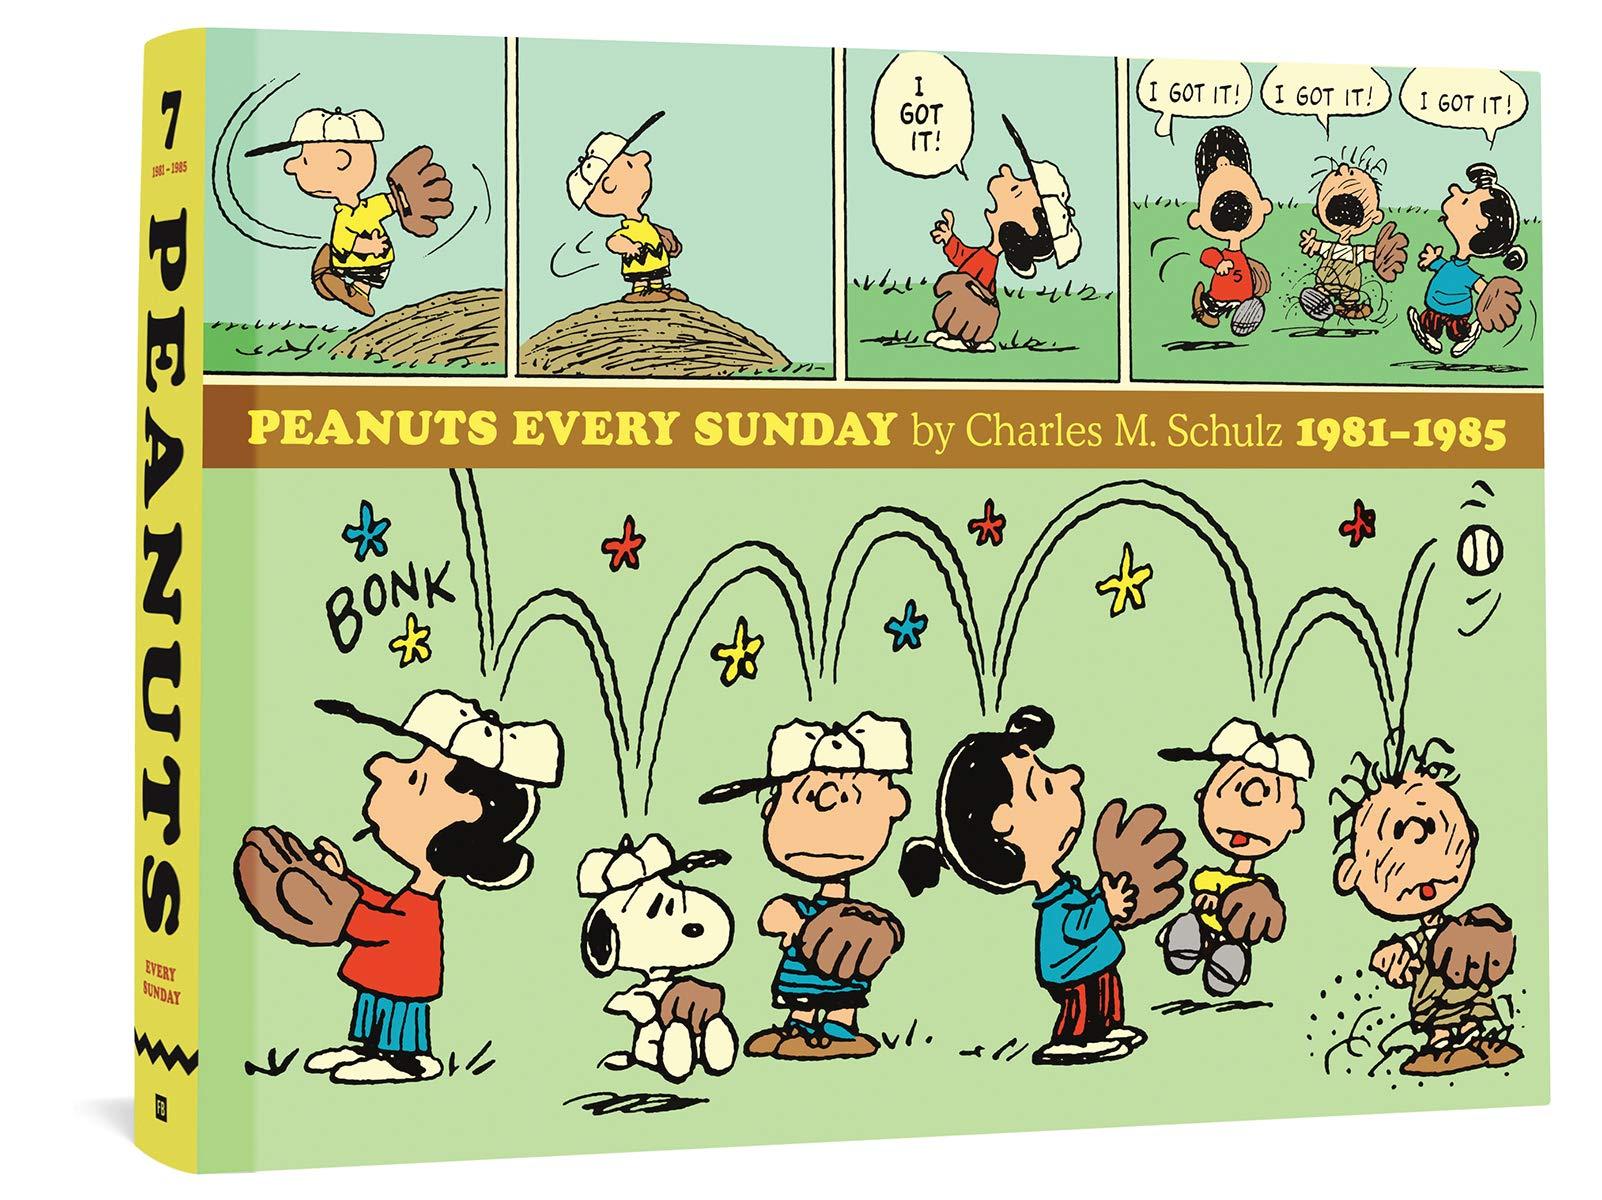 Peanuts Every Sunday 1981-1985 (Peanuts Every Sunday) by Fantagraphics